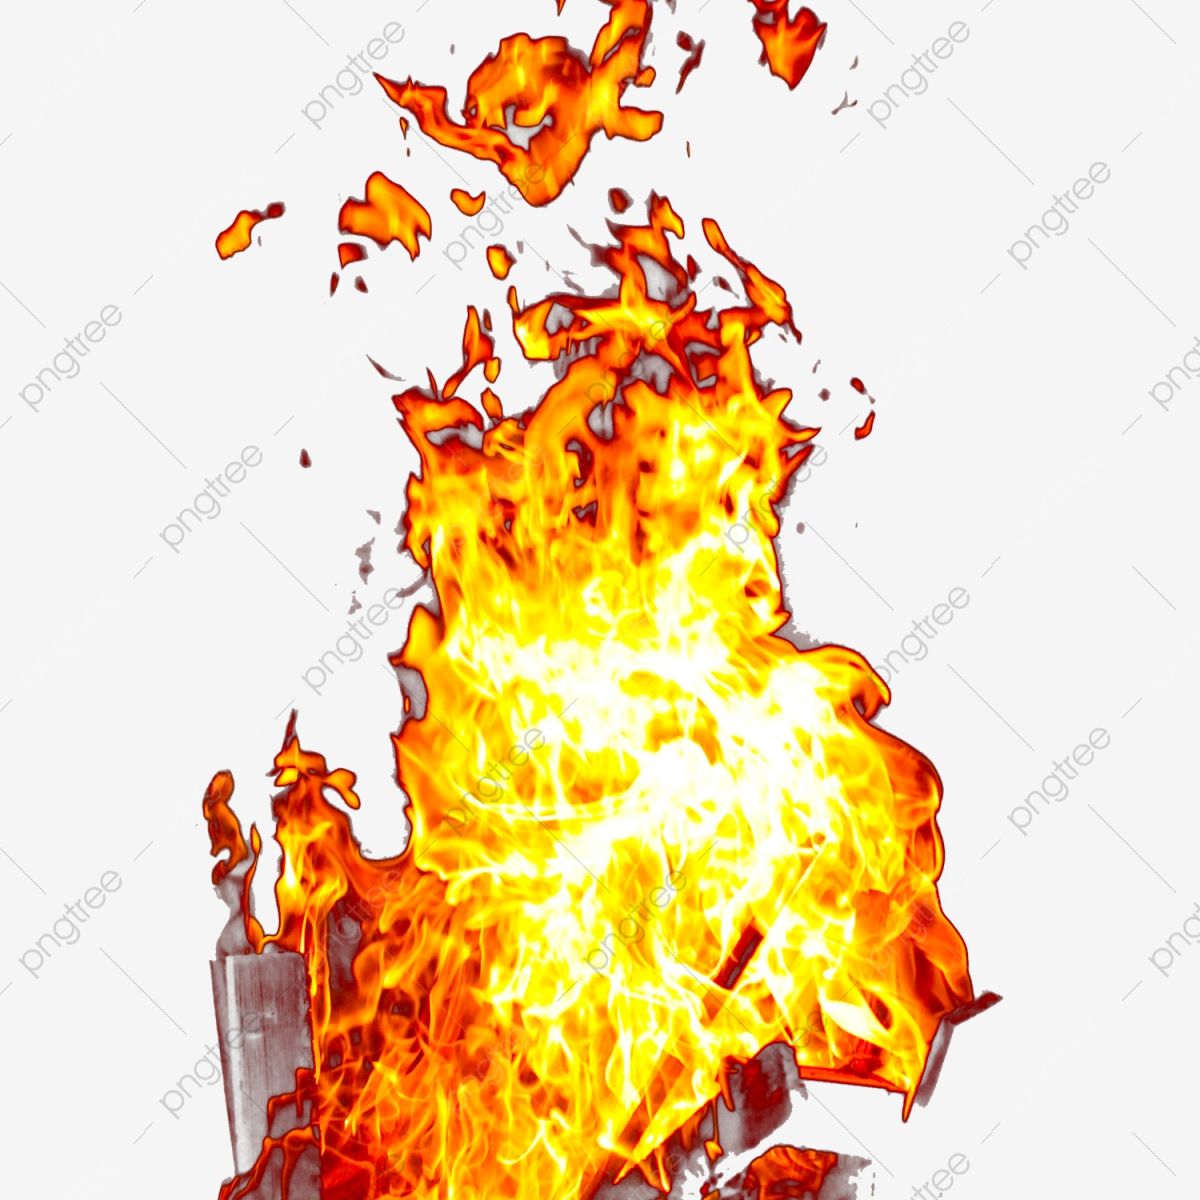 Misc clip art png. Fire clipart fire element